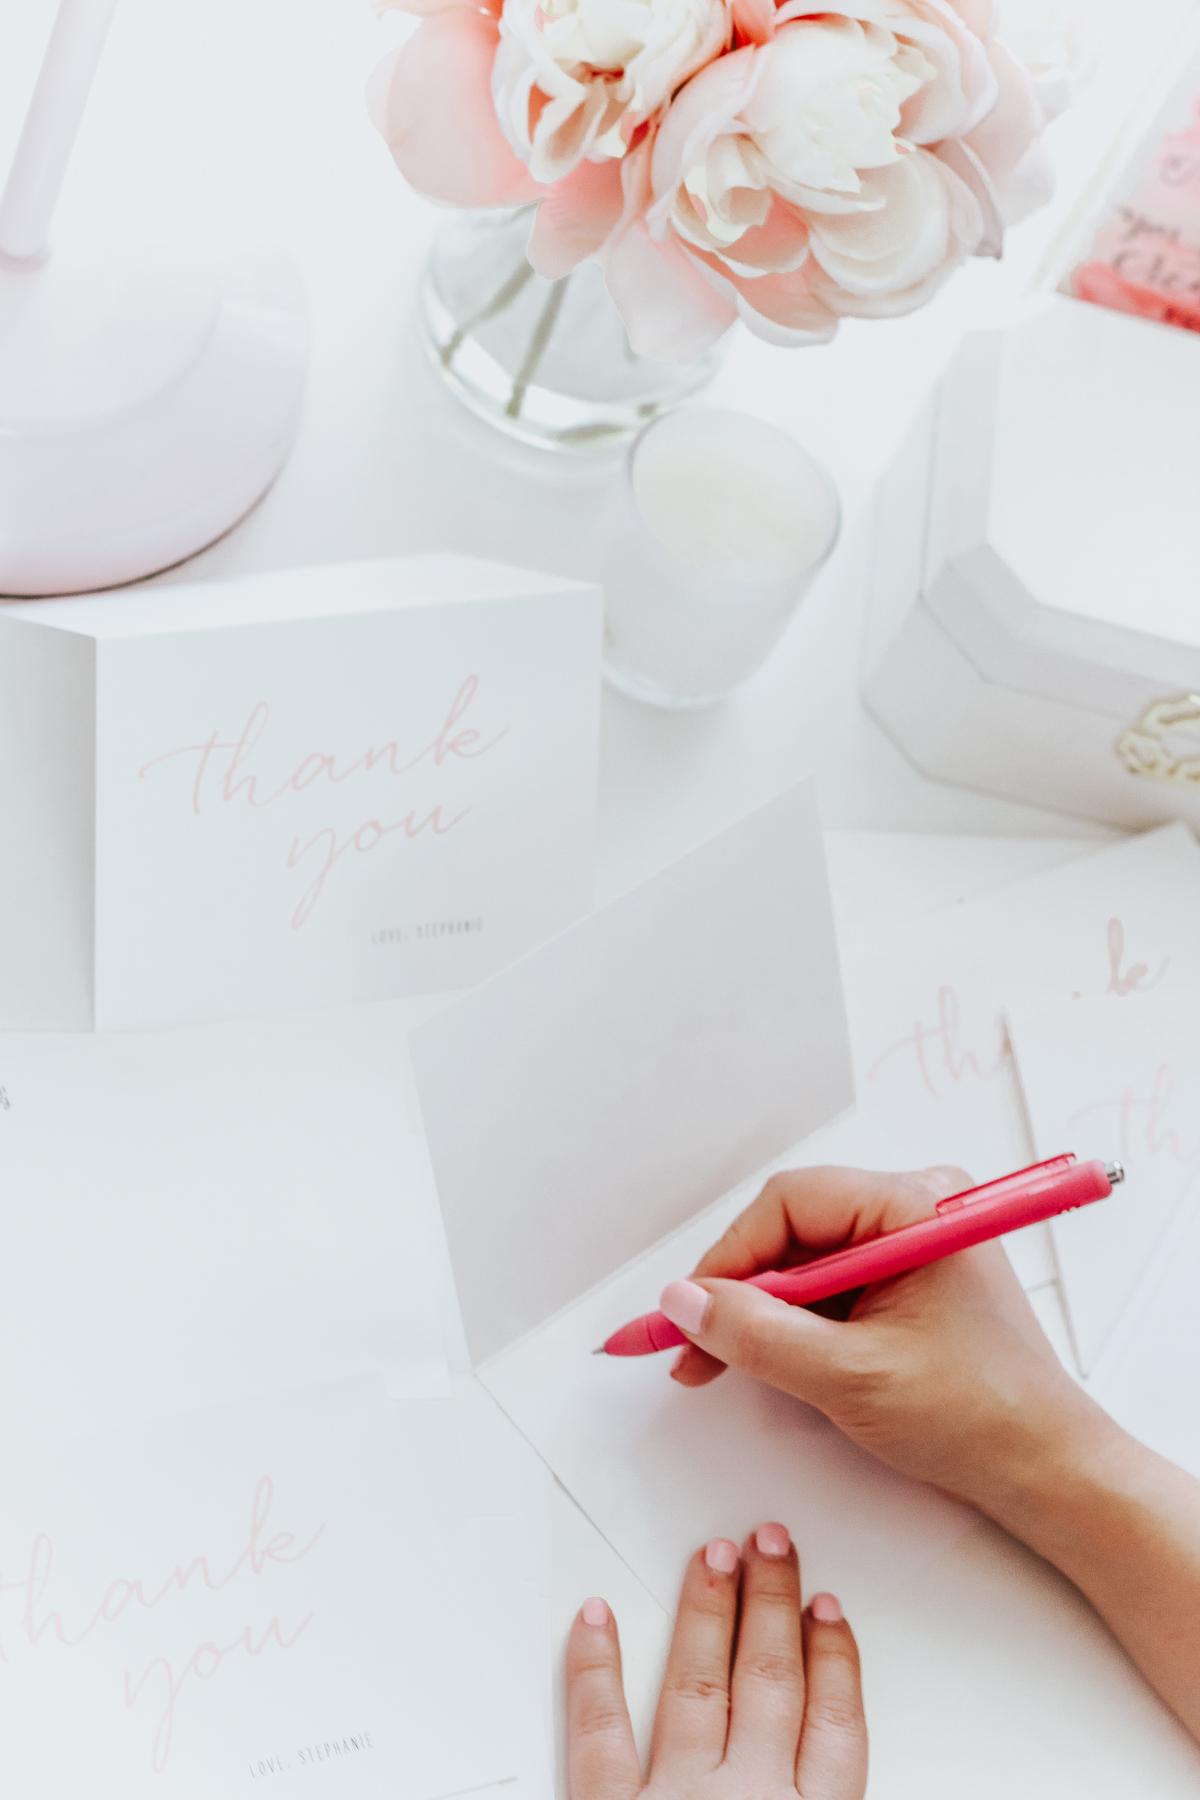 Basic Invite Thank You Notes-6